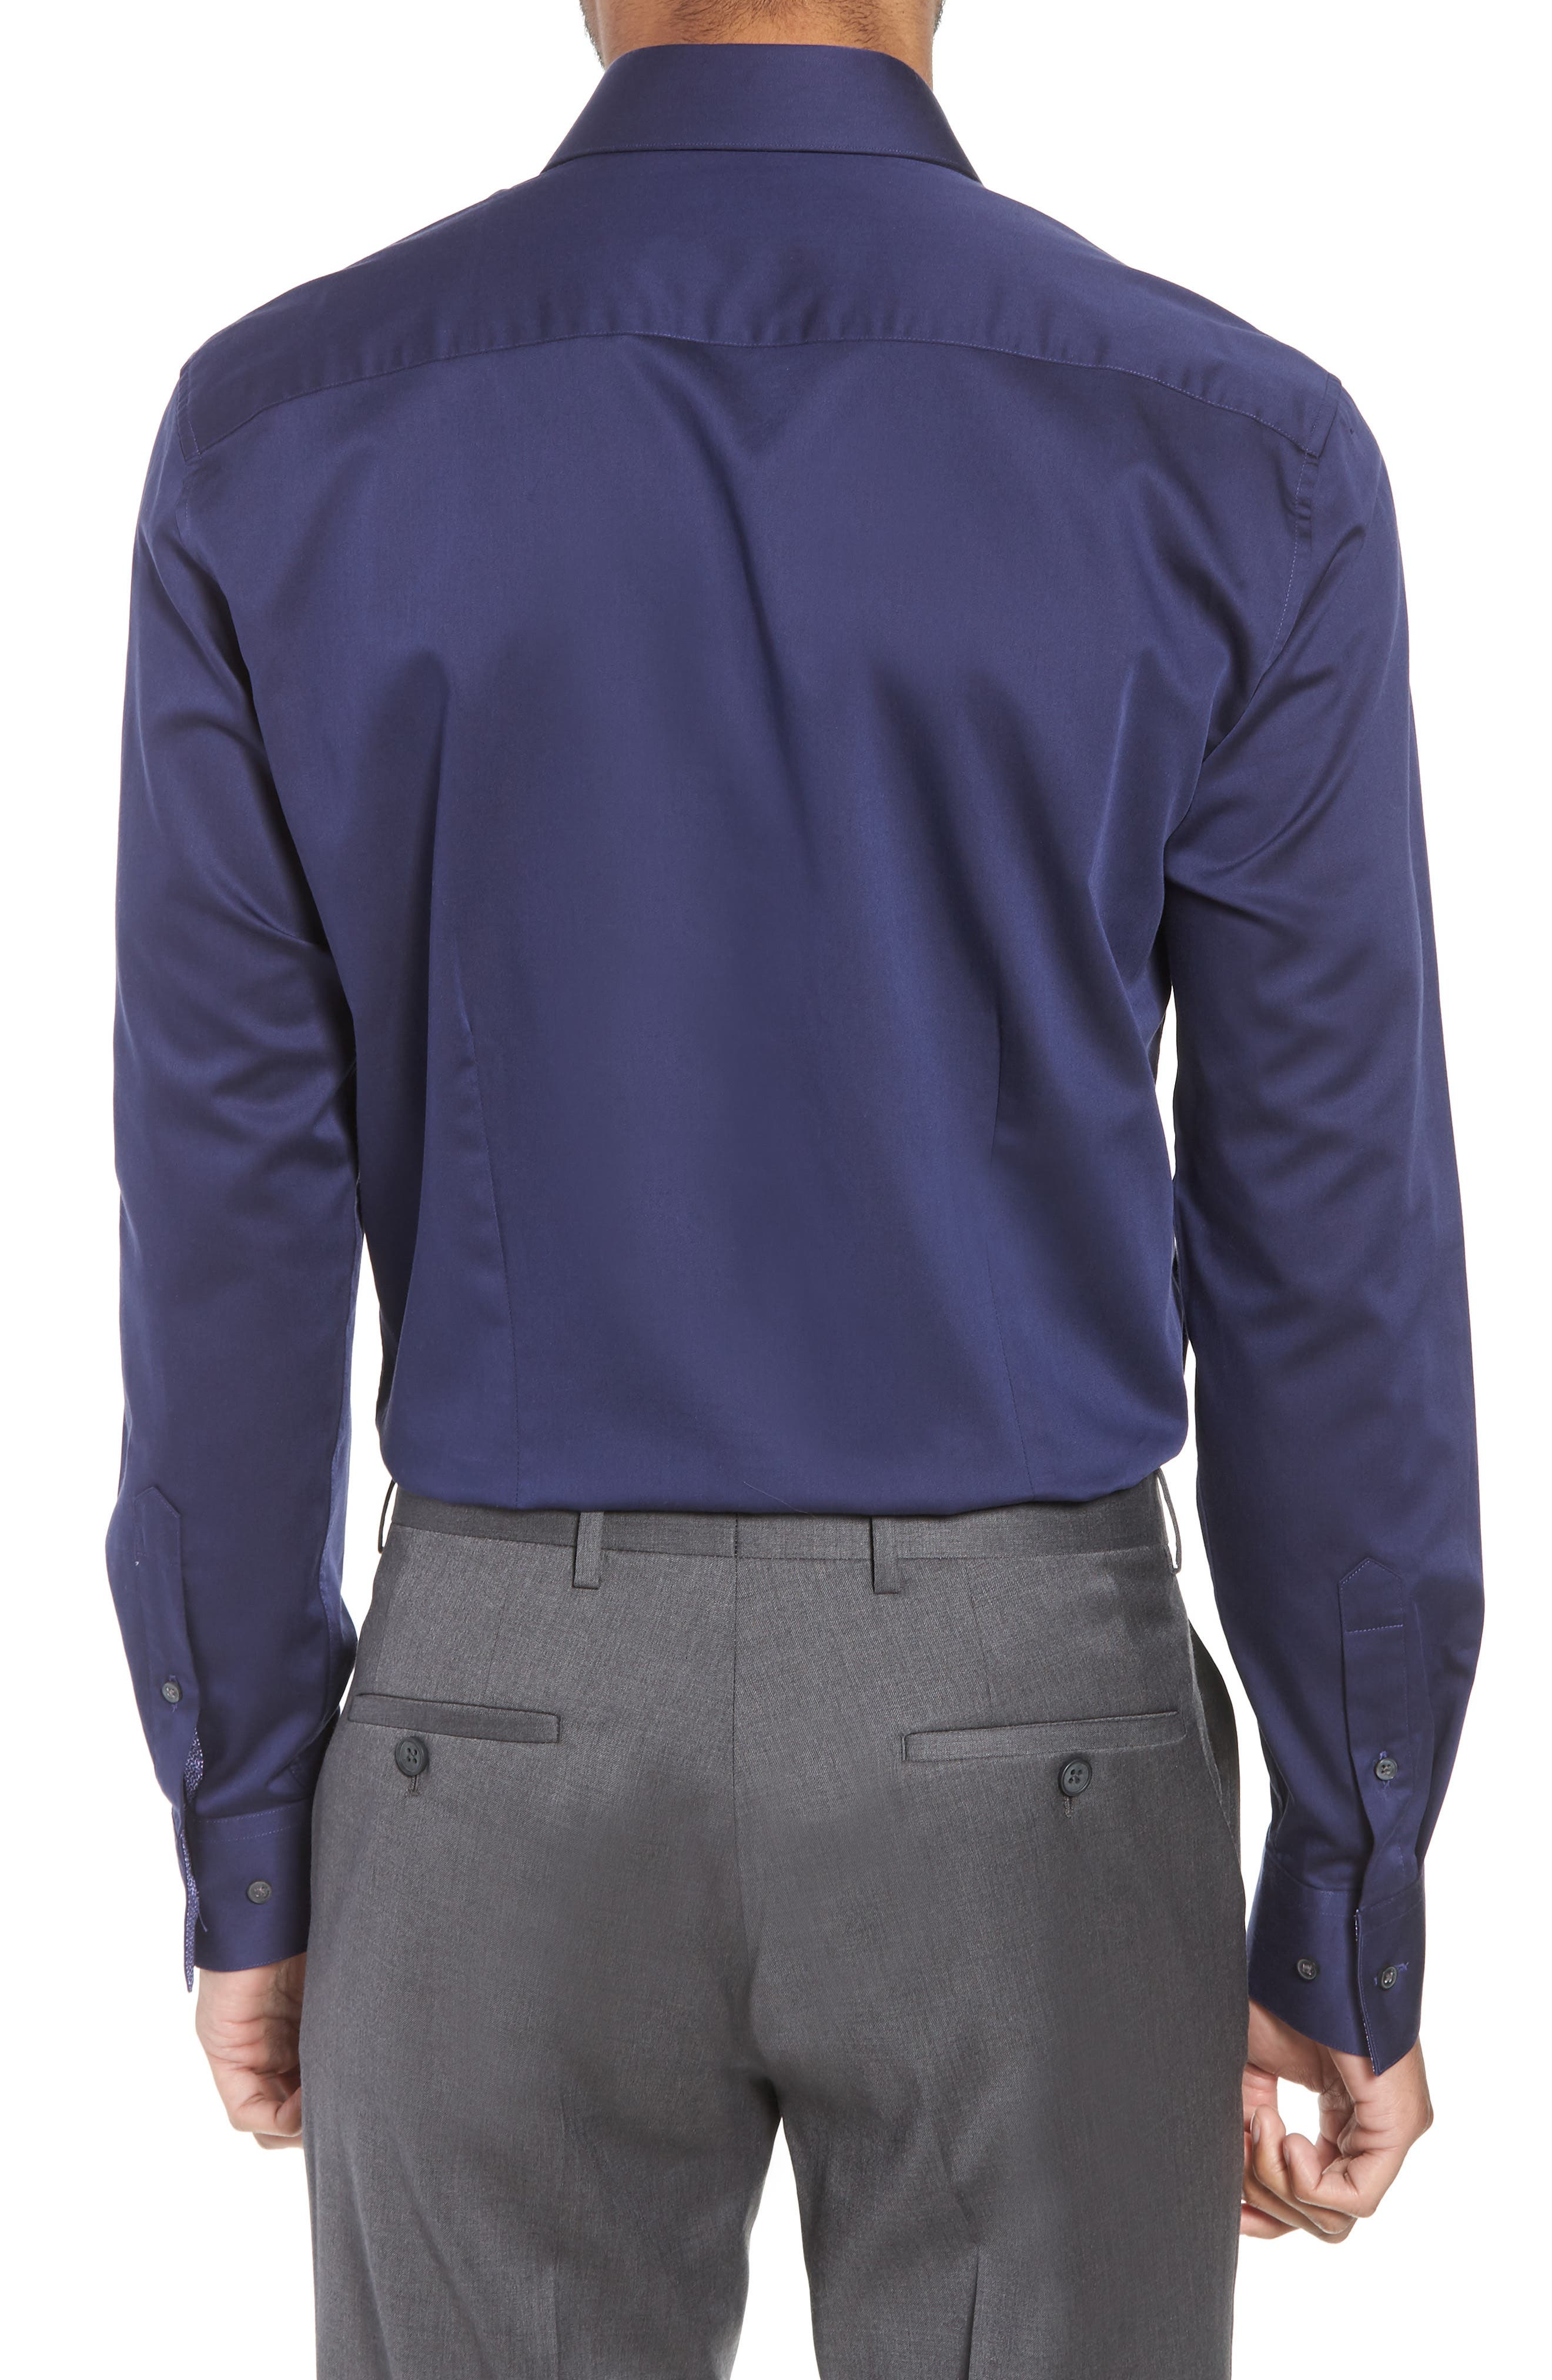 Endurance Bookers Slim Fit Solid Dress Shirt,                             Alternate thumbnail 3, color,                             Navy